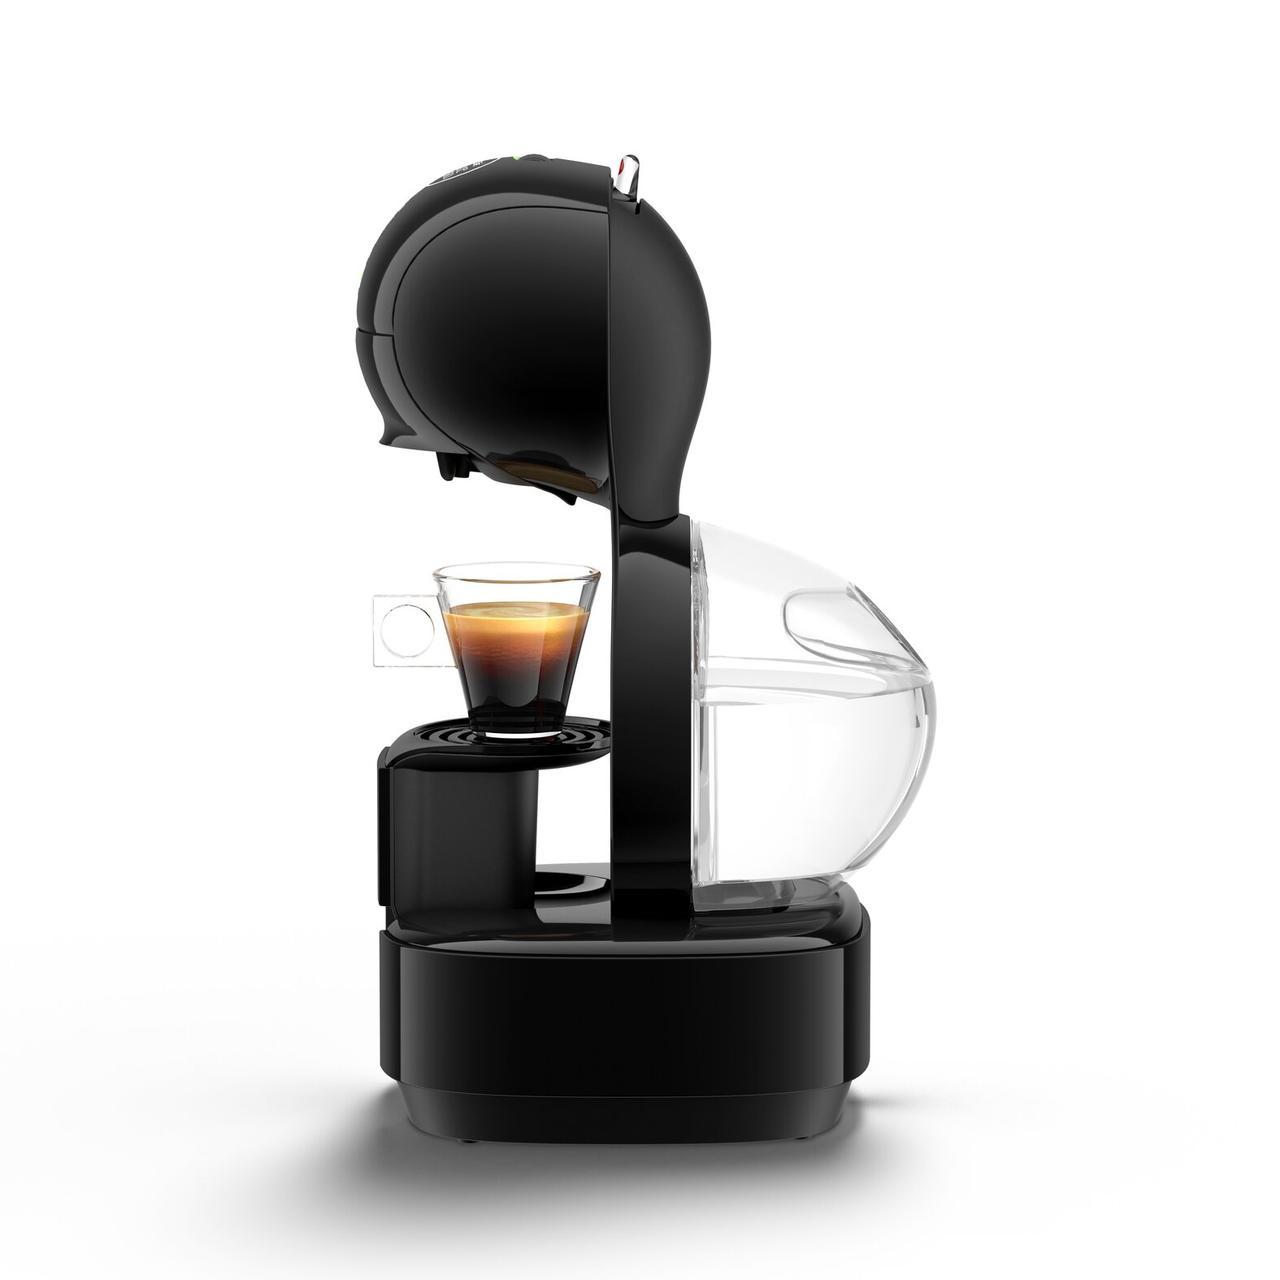 Капсульная кофеварка Krups Dolce Gusto LUMIO Black KP1308